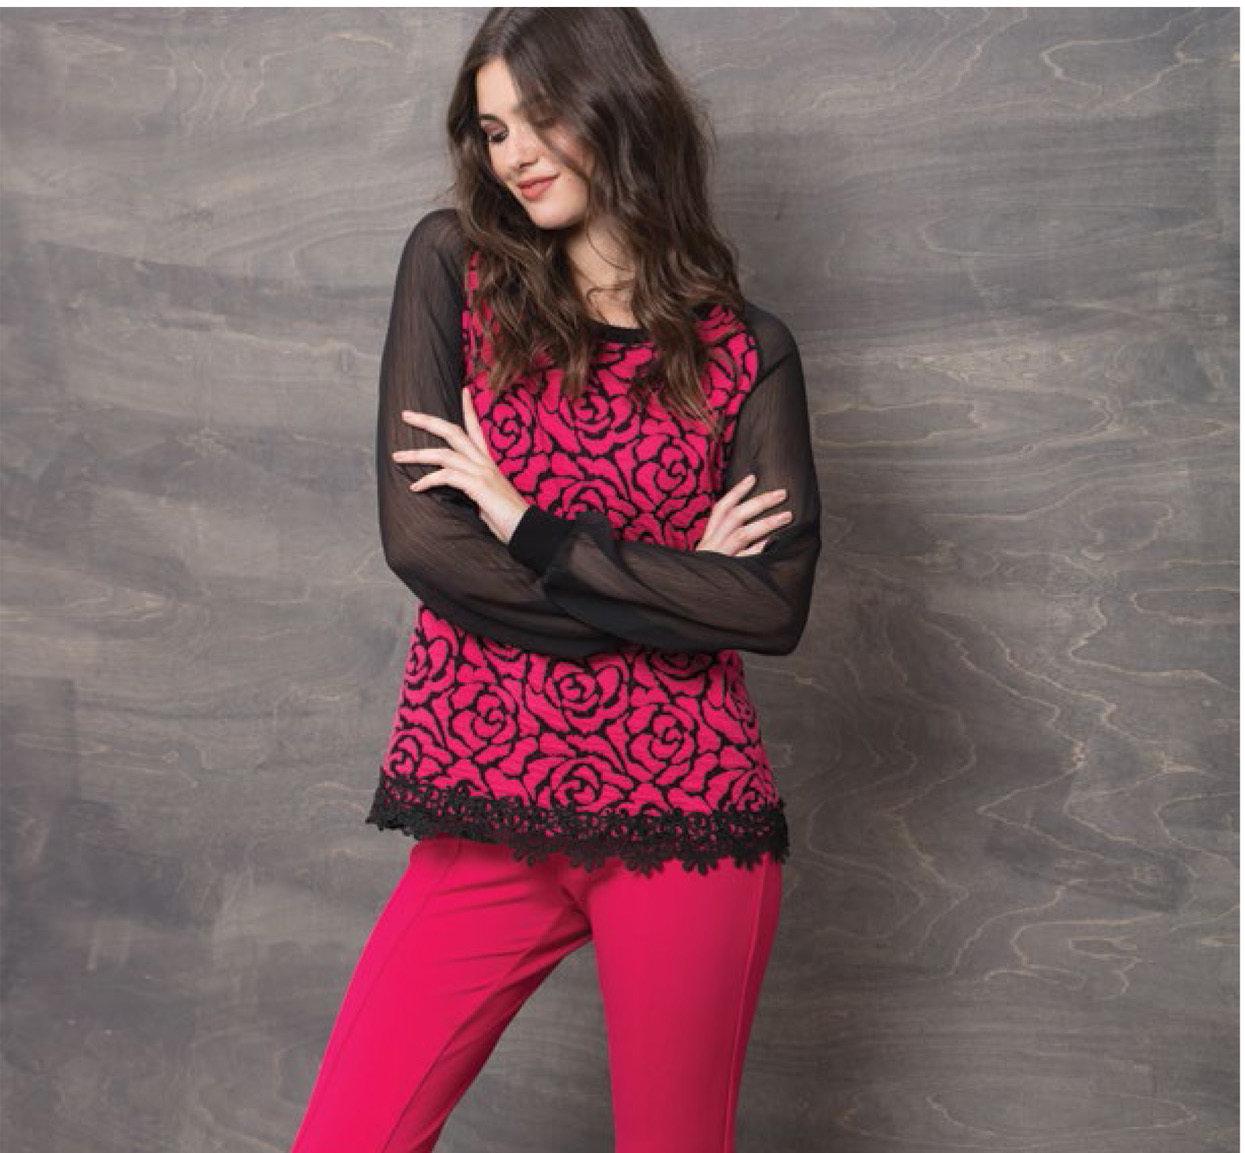 Maloka: Fuschia Rose Imprinted Asymmetrical Hem Sweater (2 Left!) MK_MARIE_N1